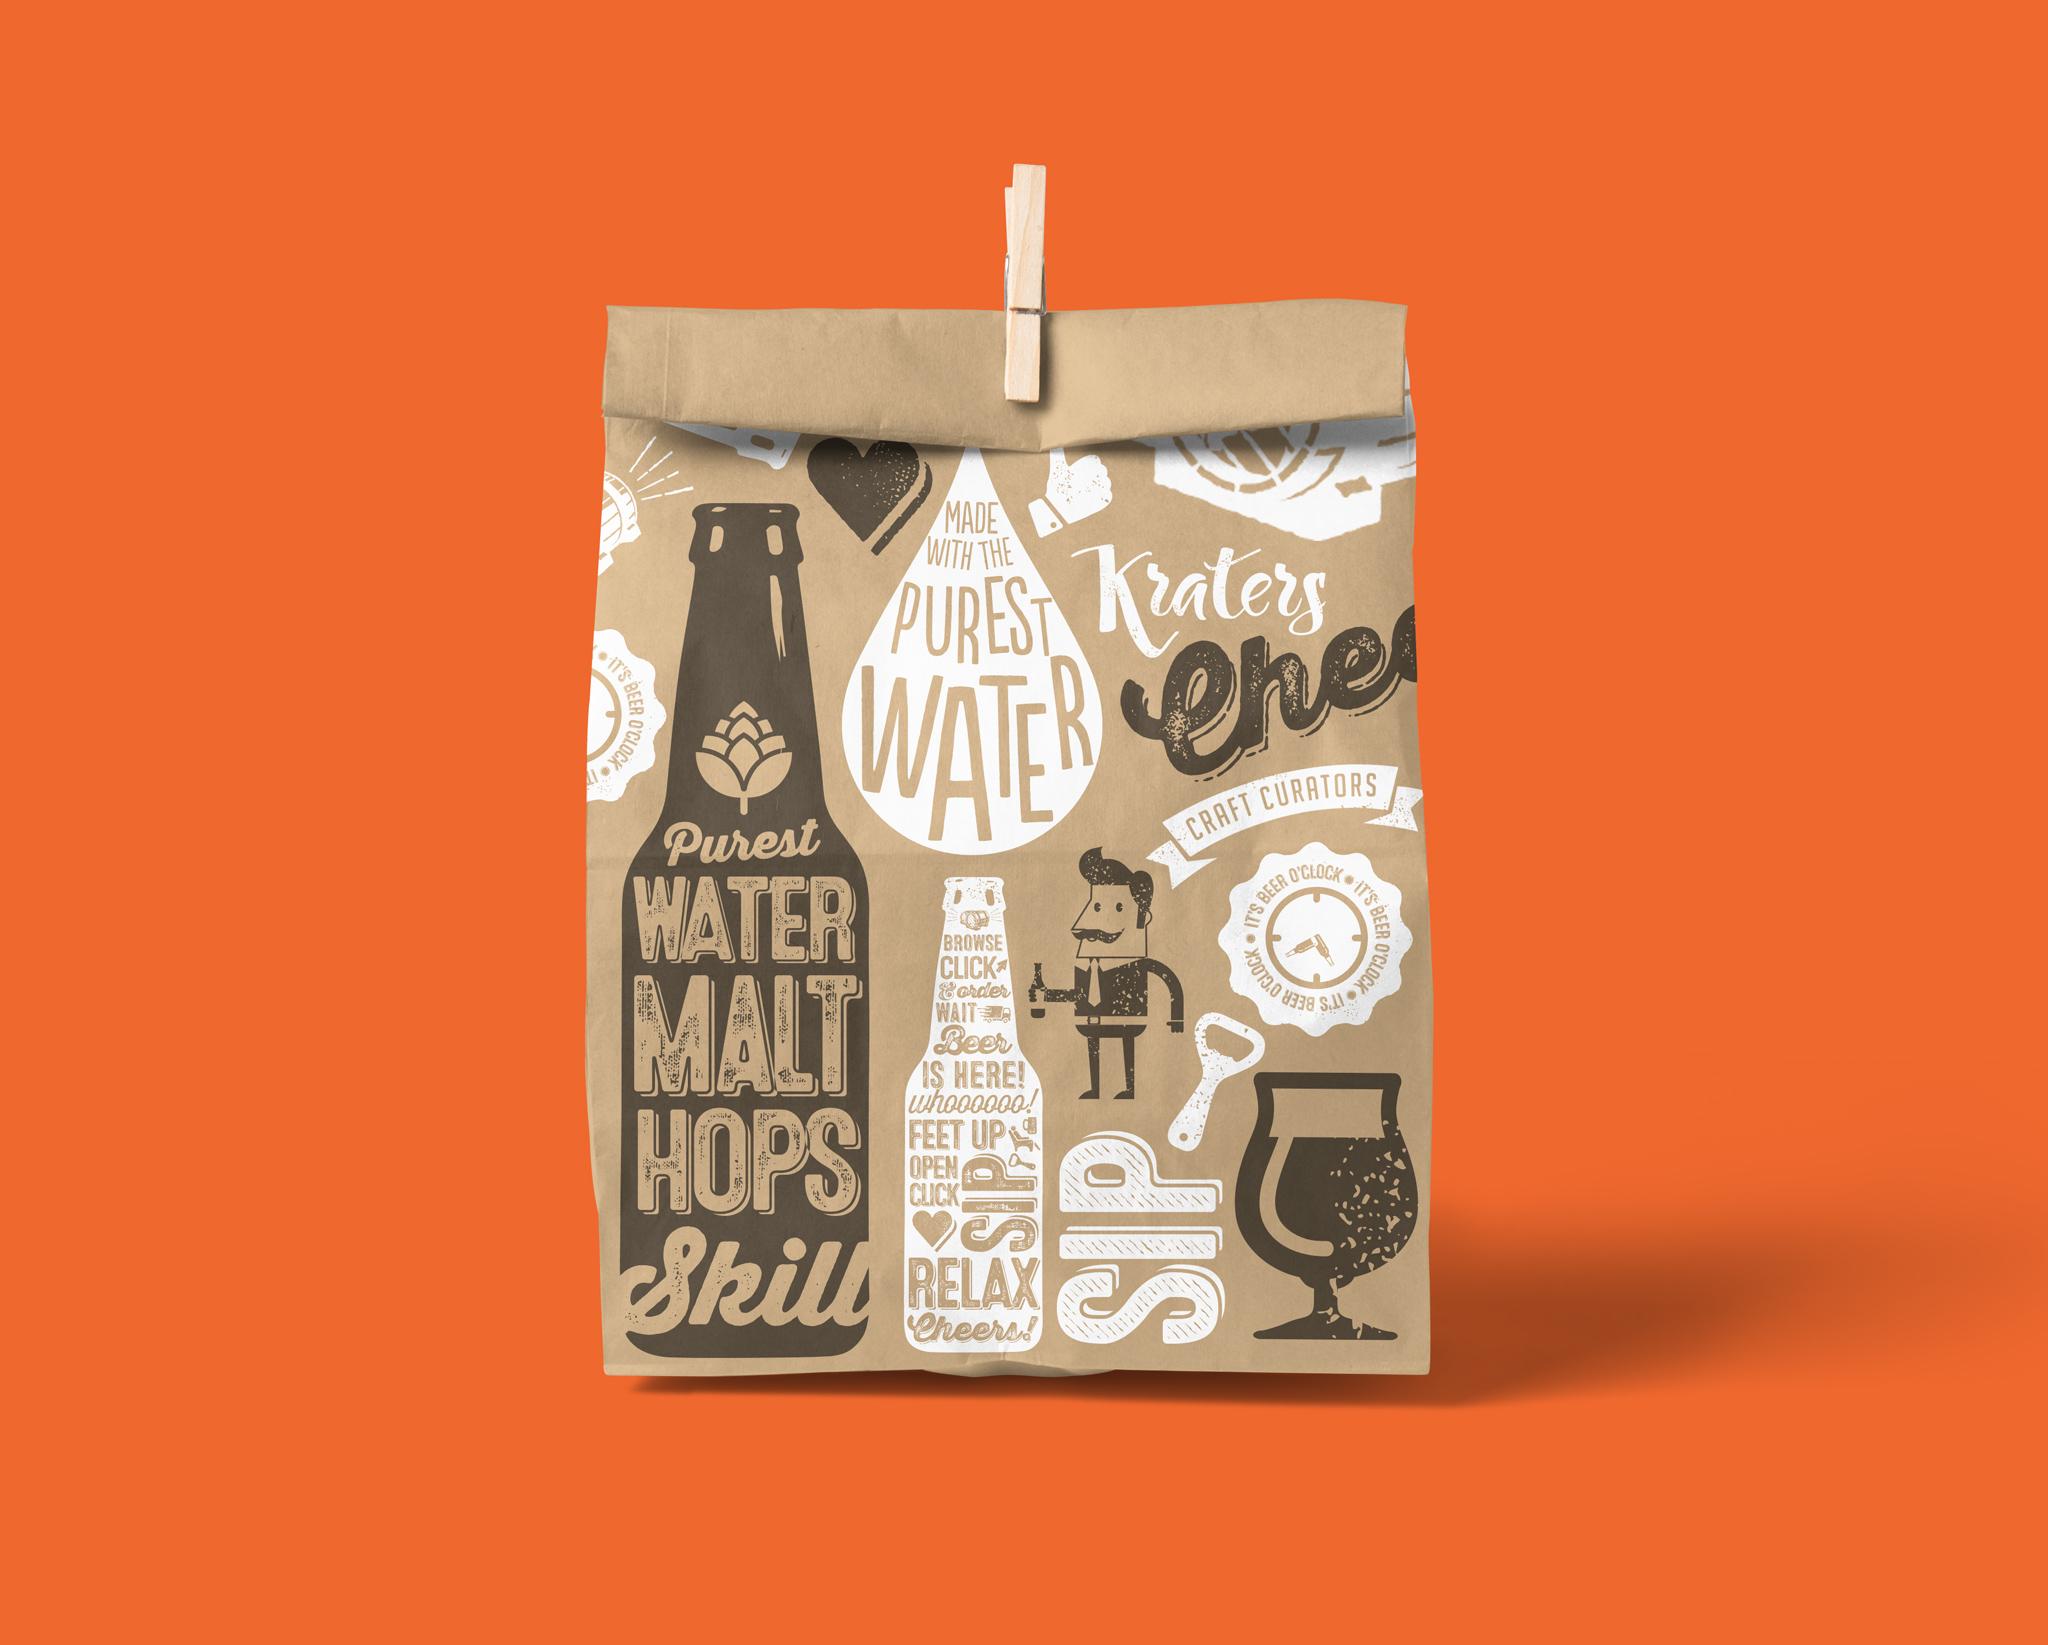 bespoke packaging in the uk